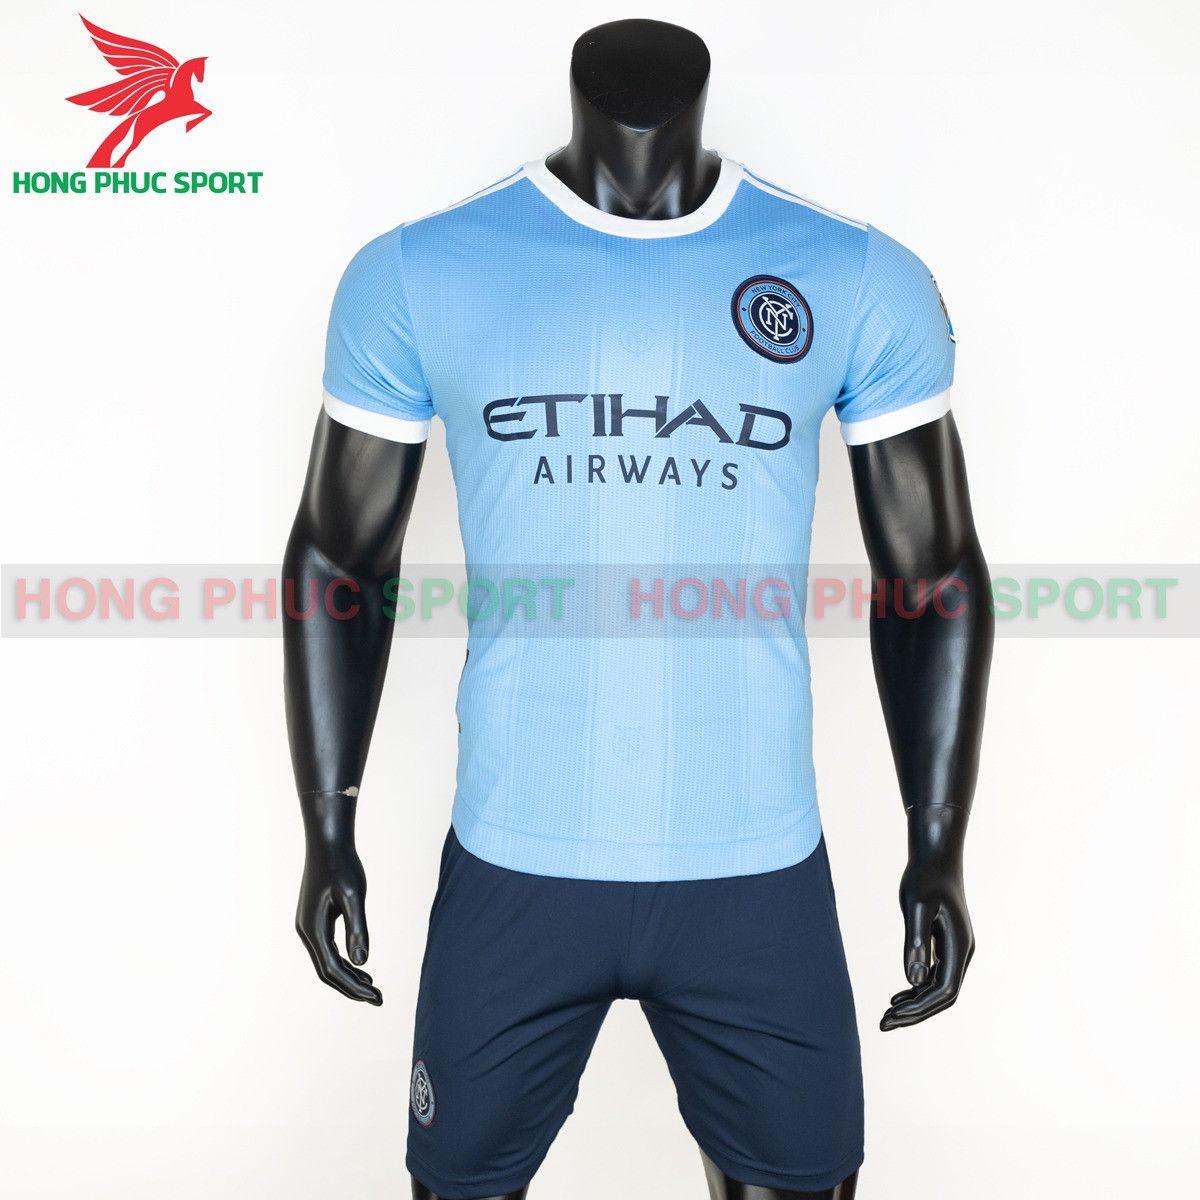 https://cdn.hongphucsport.com/unsafe/s4.shopbay.vn/files/285/ao-dau-new-york-city-2021-2022-san-nha-thailand-1-614add2c17e21.jpg